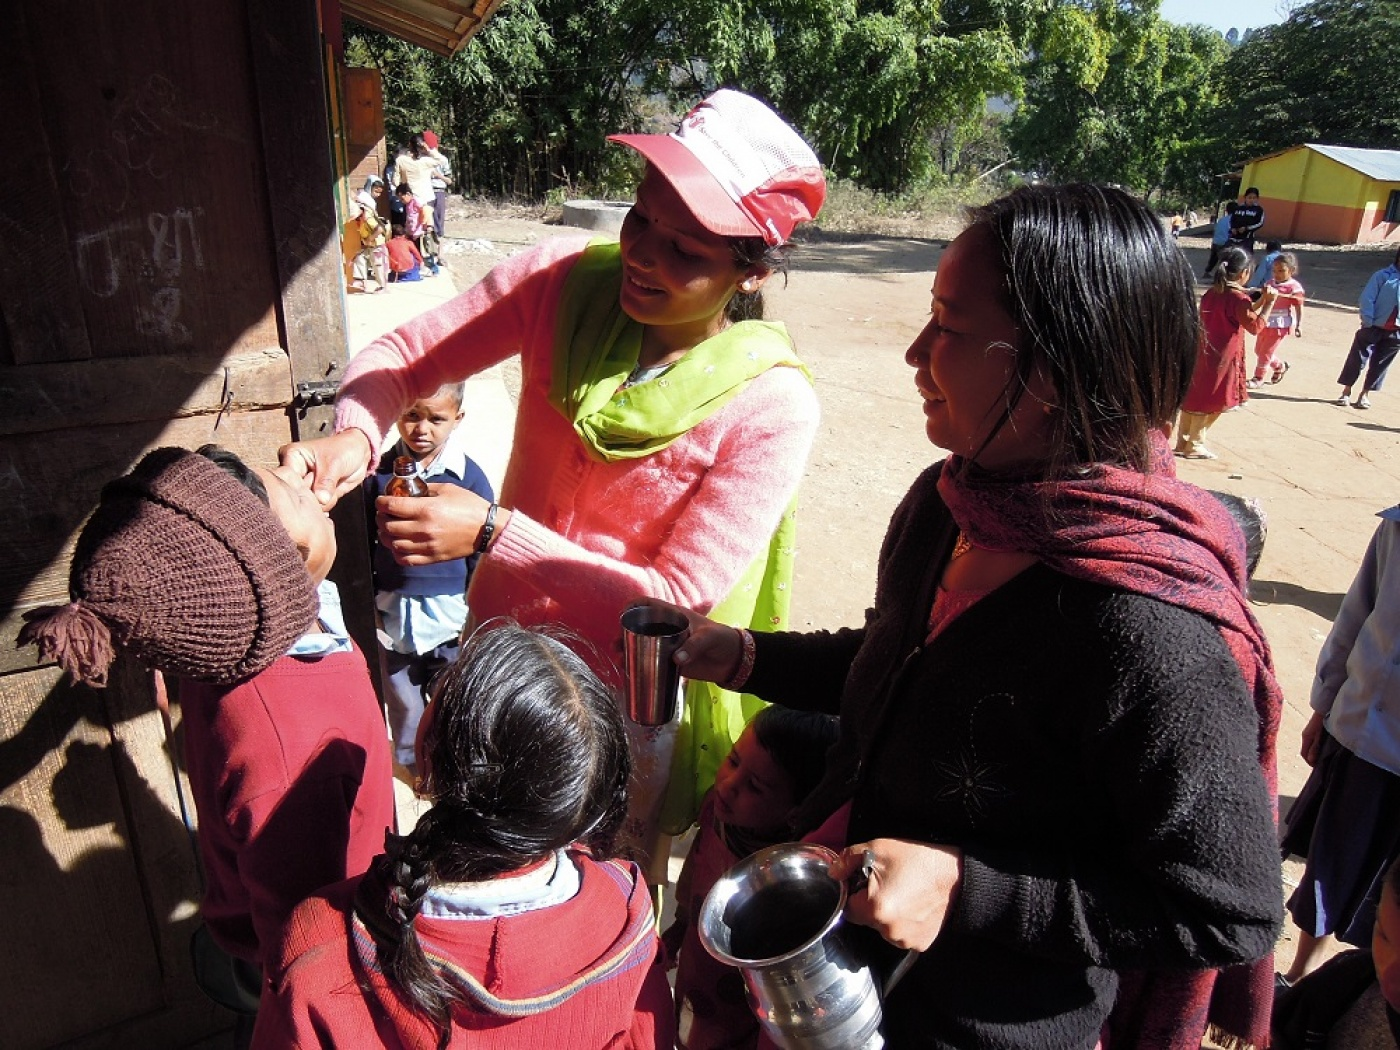 siti di incontri per il Nepal datazione di una donna fieramente indipendente